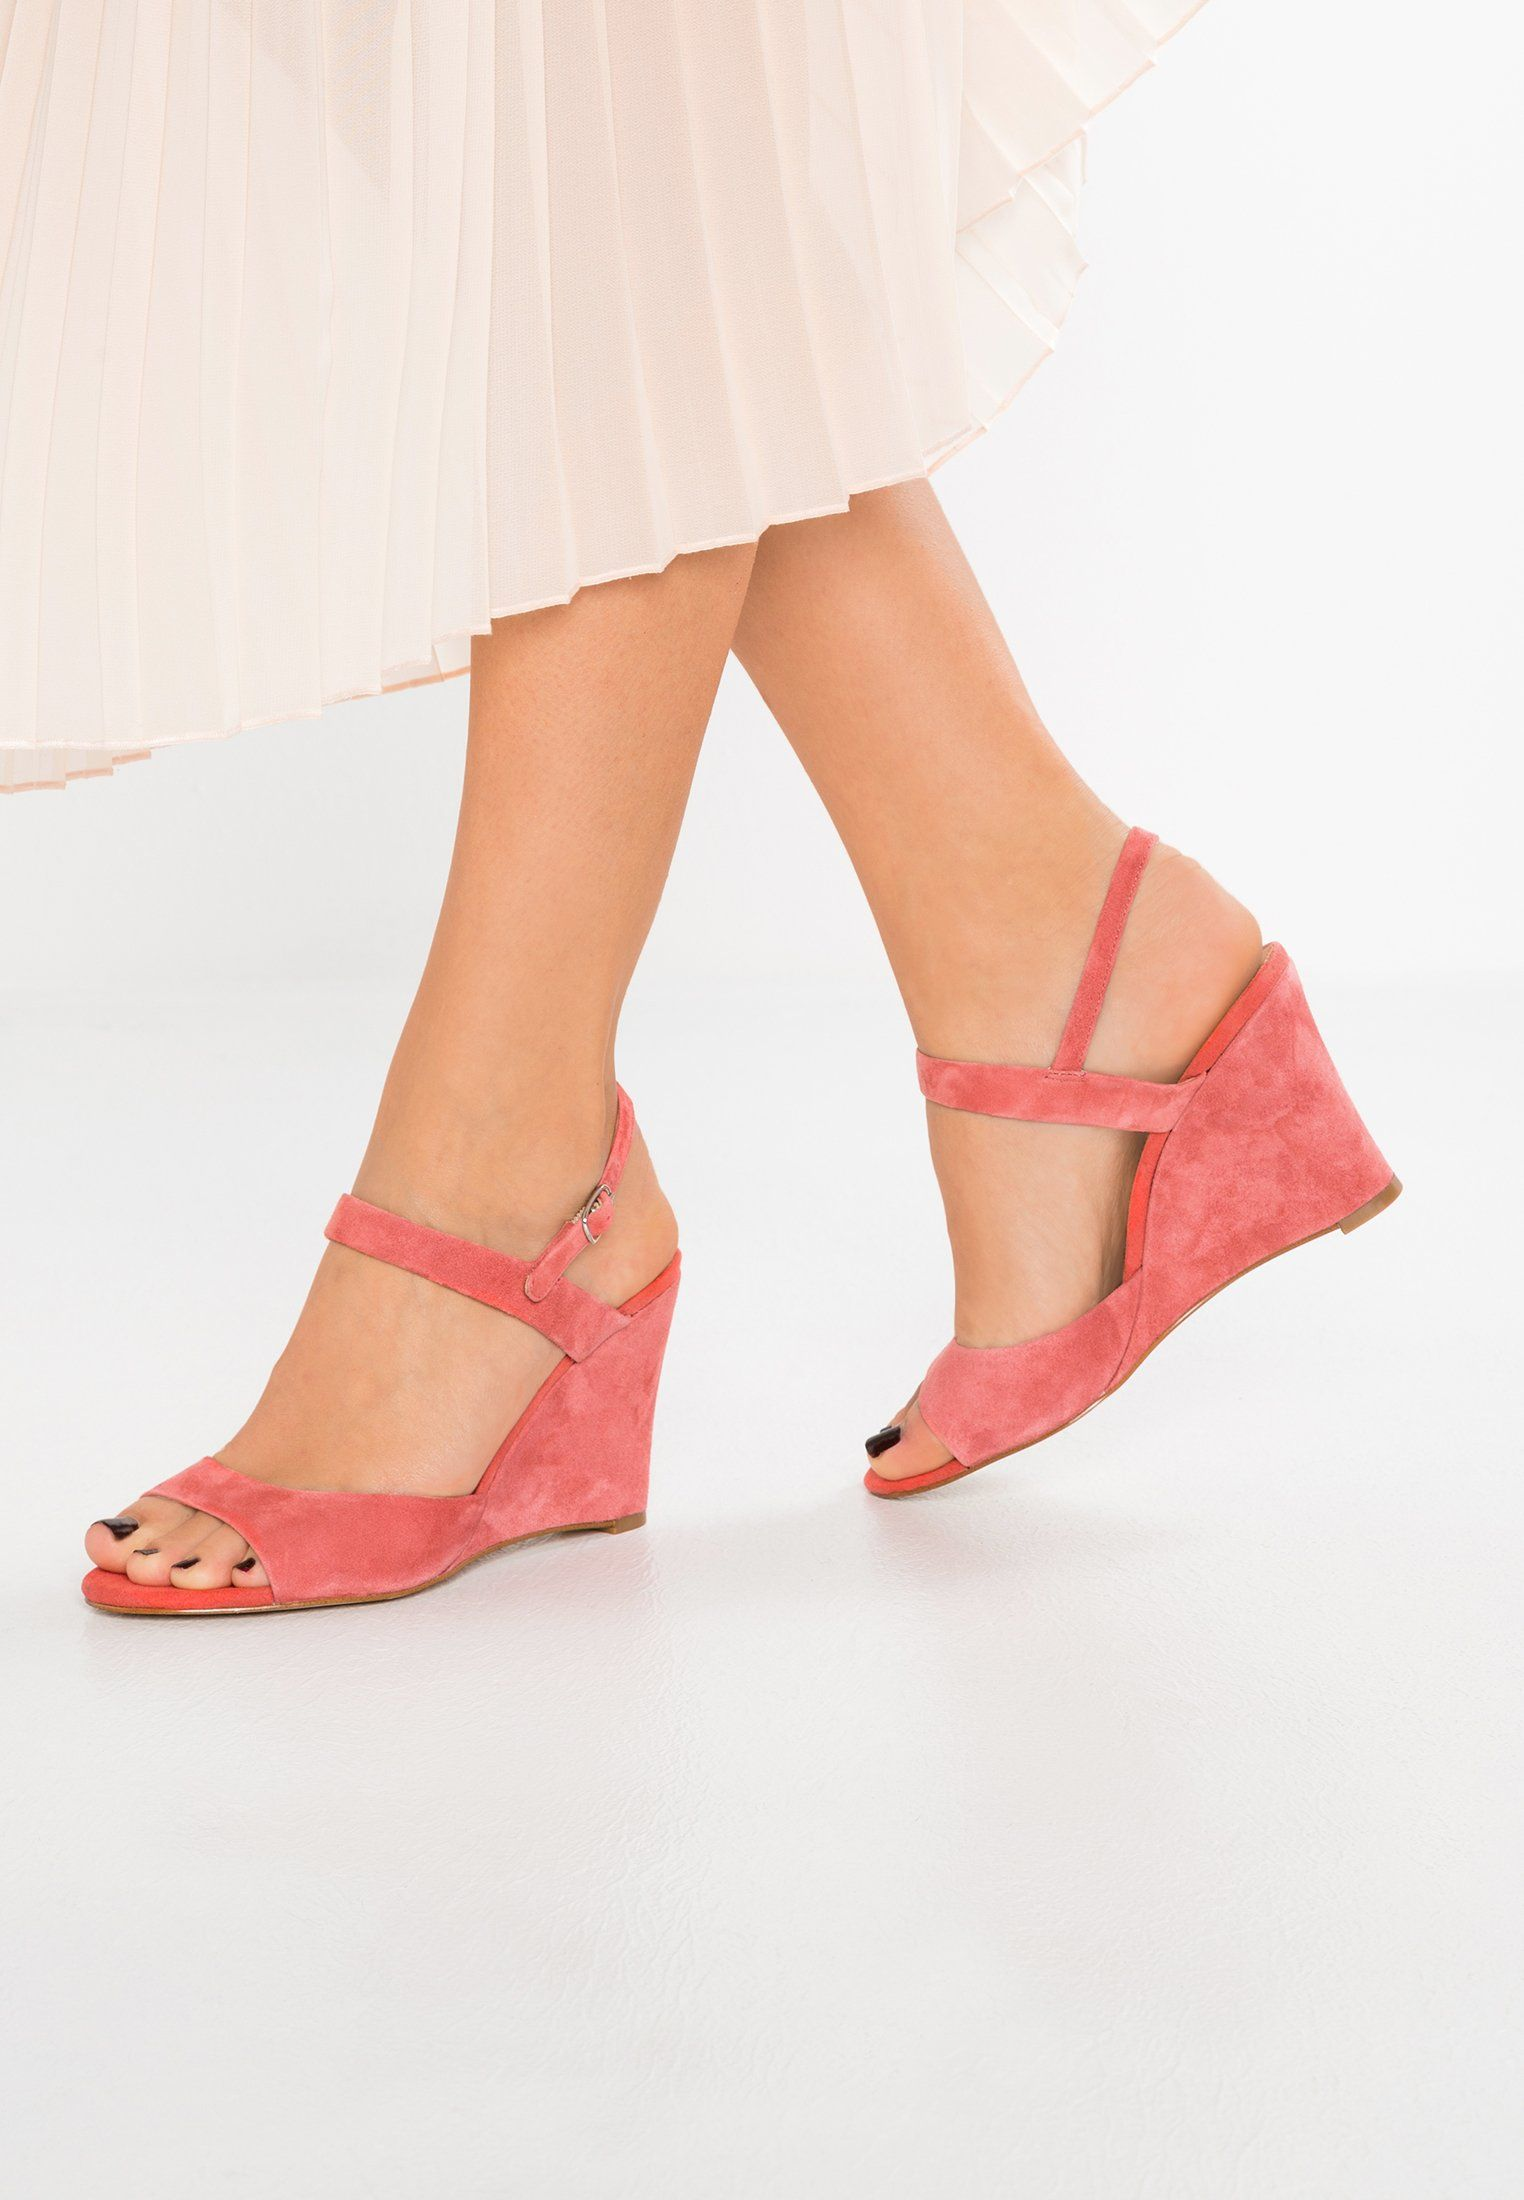 24a59fe471a5a4 KIOMI High heeled sandals - coral - Zalando.co.uk